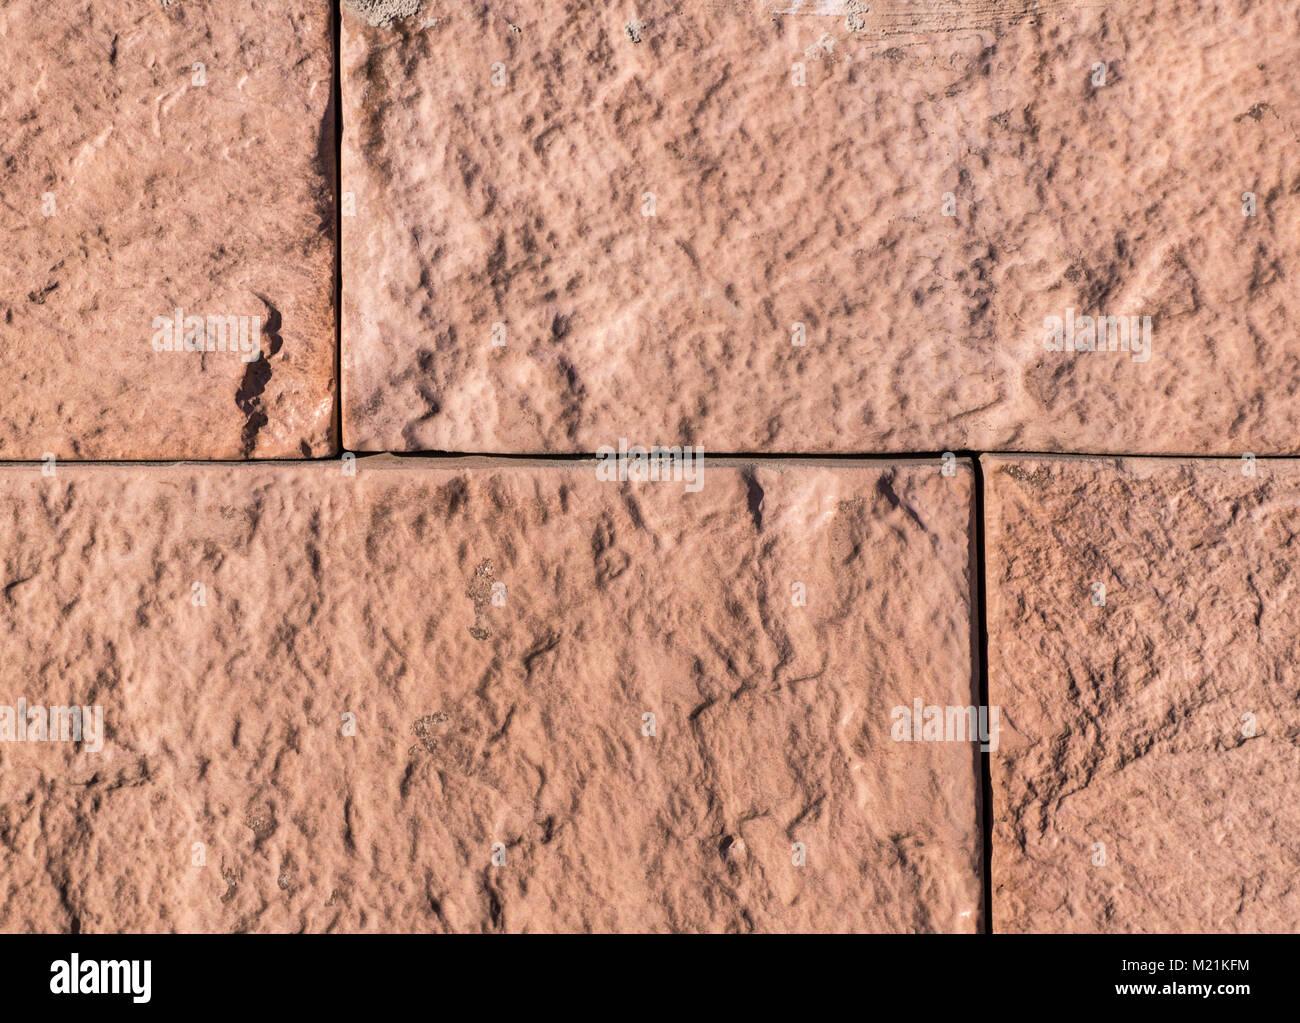 orange sandstone tiled wall. texture, background. - Stock Image